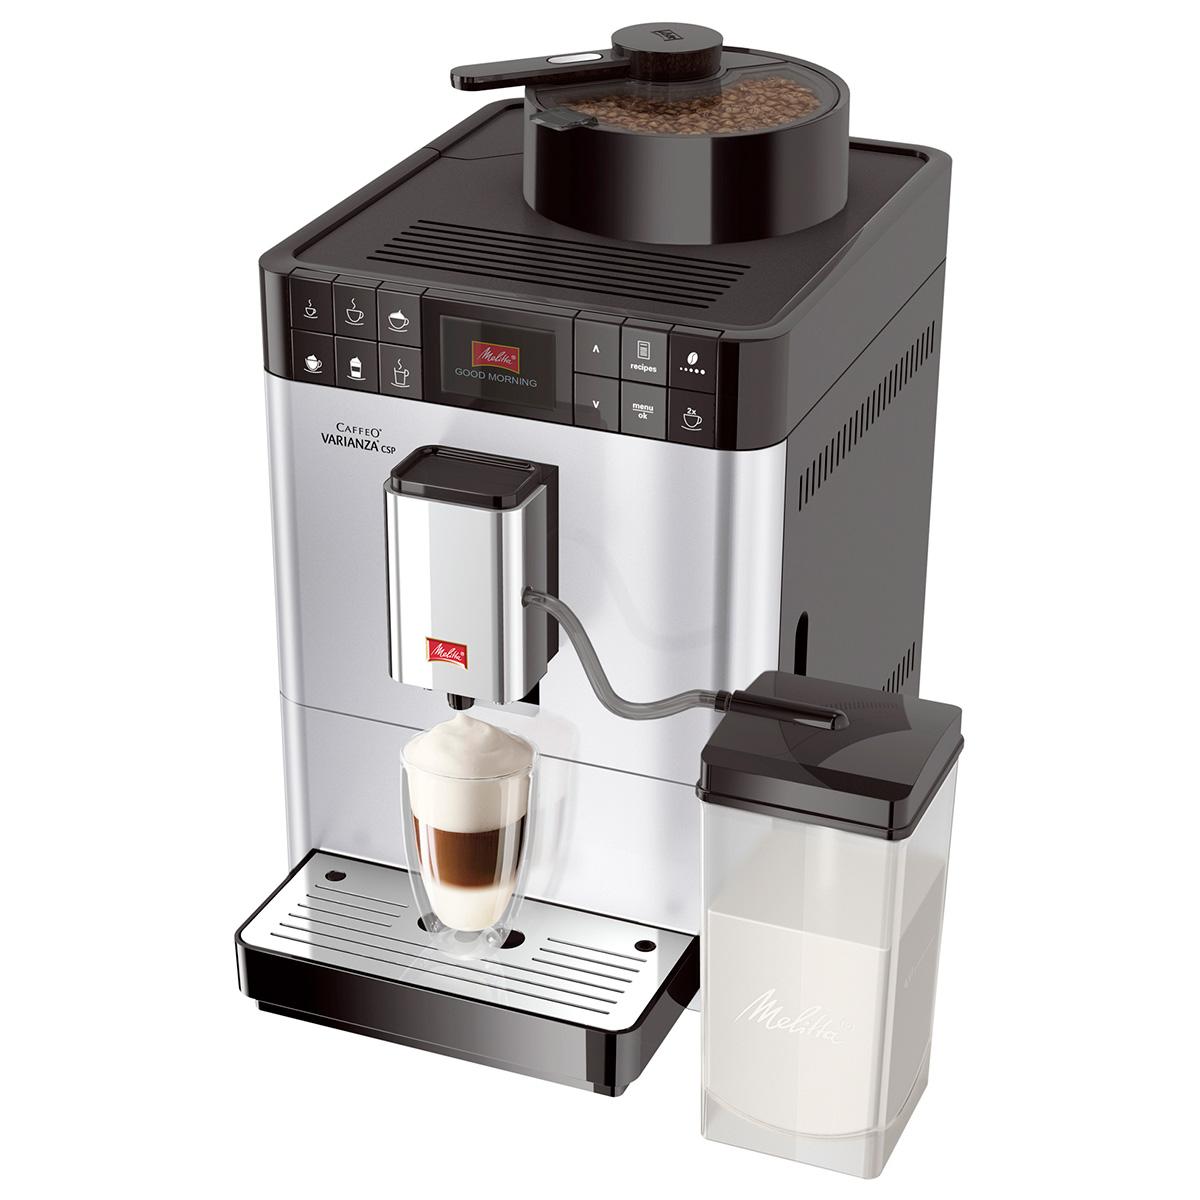 Image of   Melitta espressomaskine - Caffeo Varianza CSP - Sølv